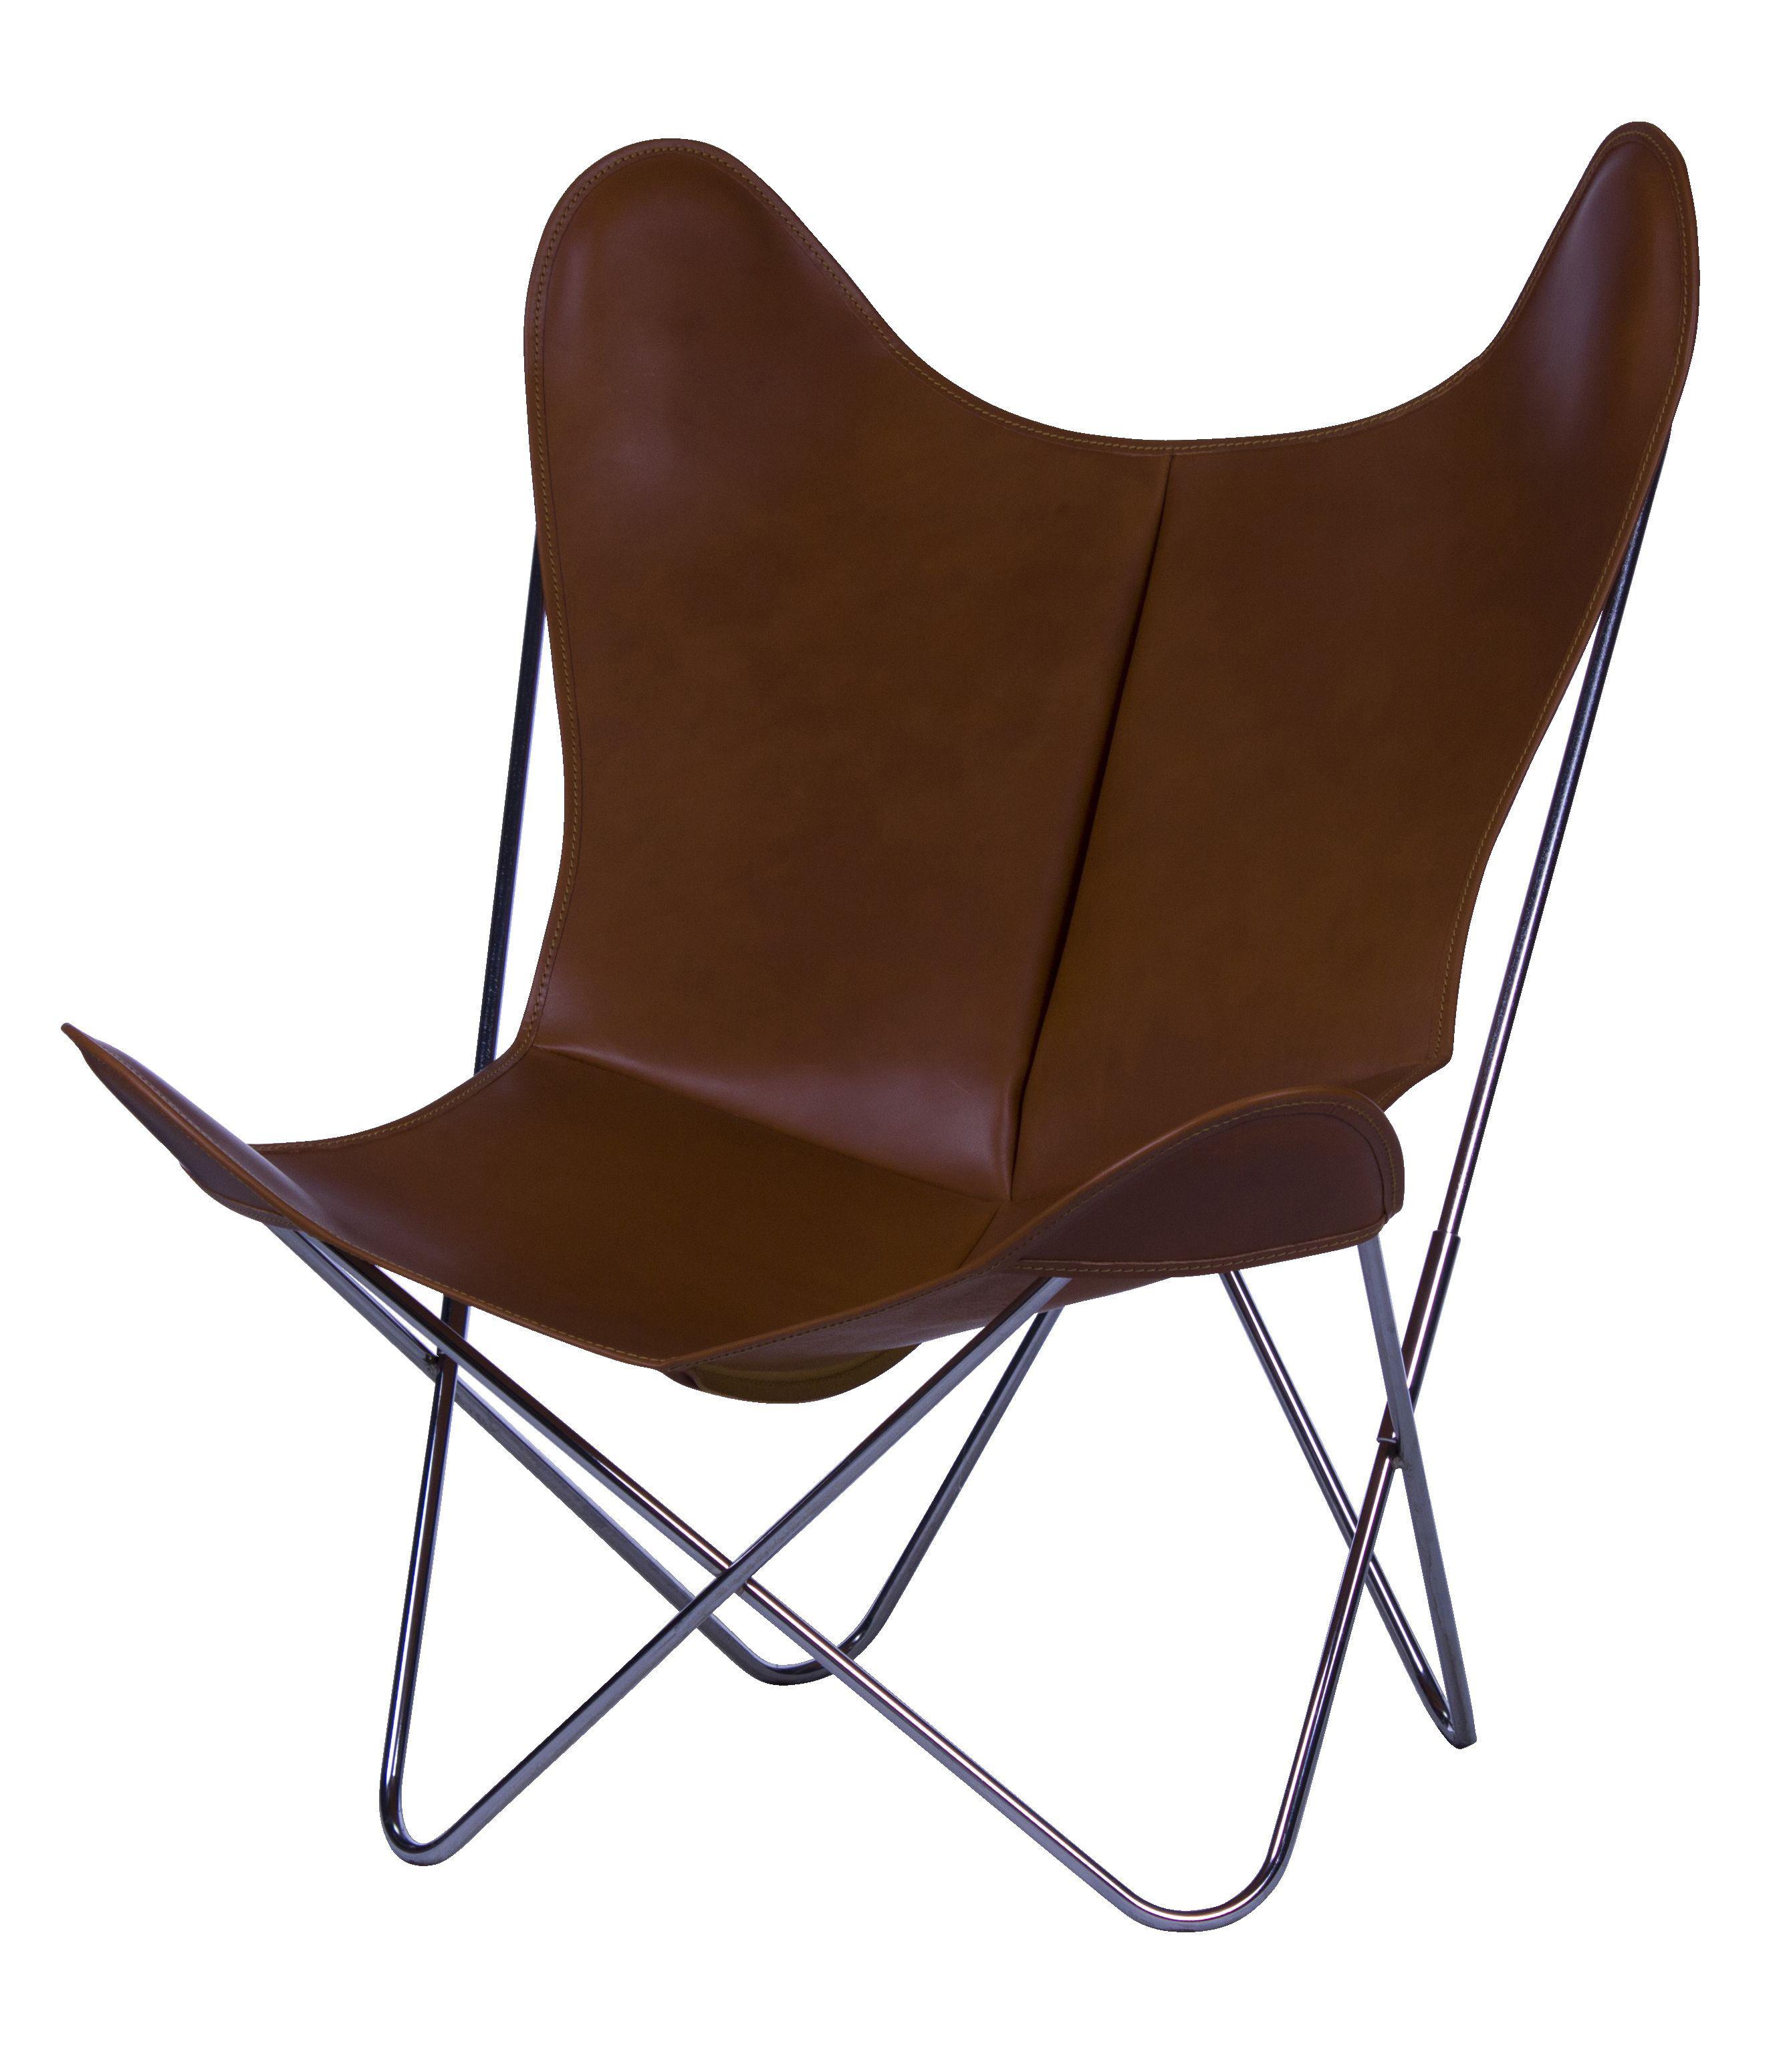 fauteuil aa butterfly aa new design marron fonc. Black Bedroom Furniture Sets. Home Design Ideas